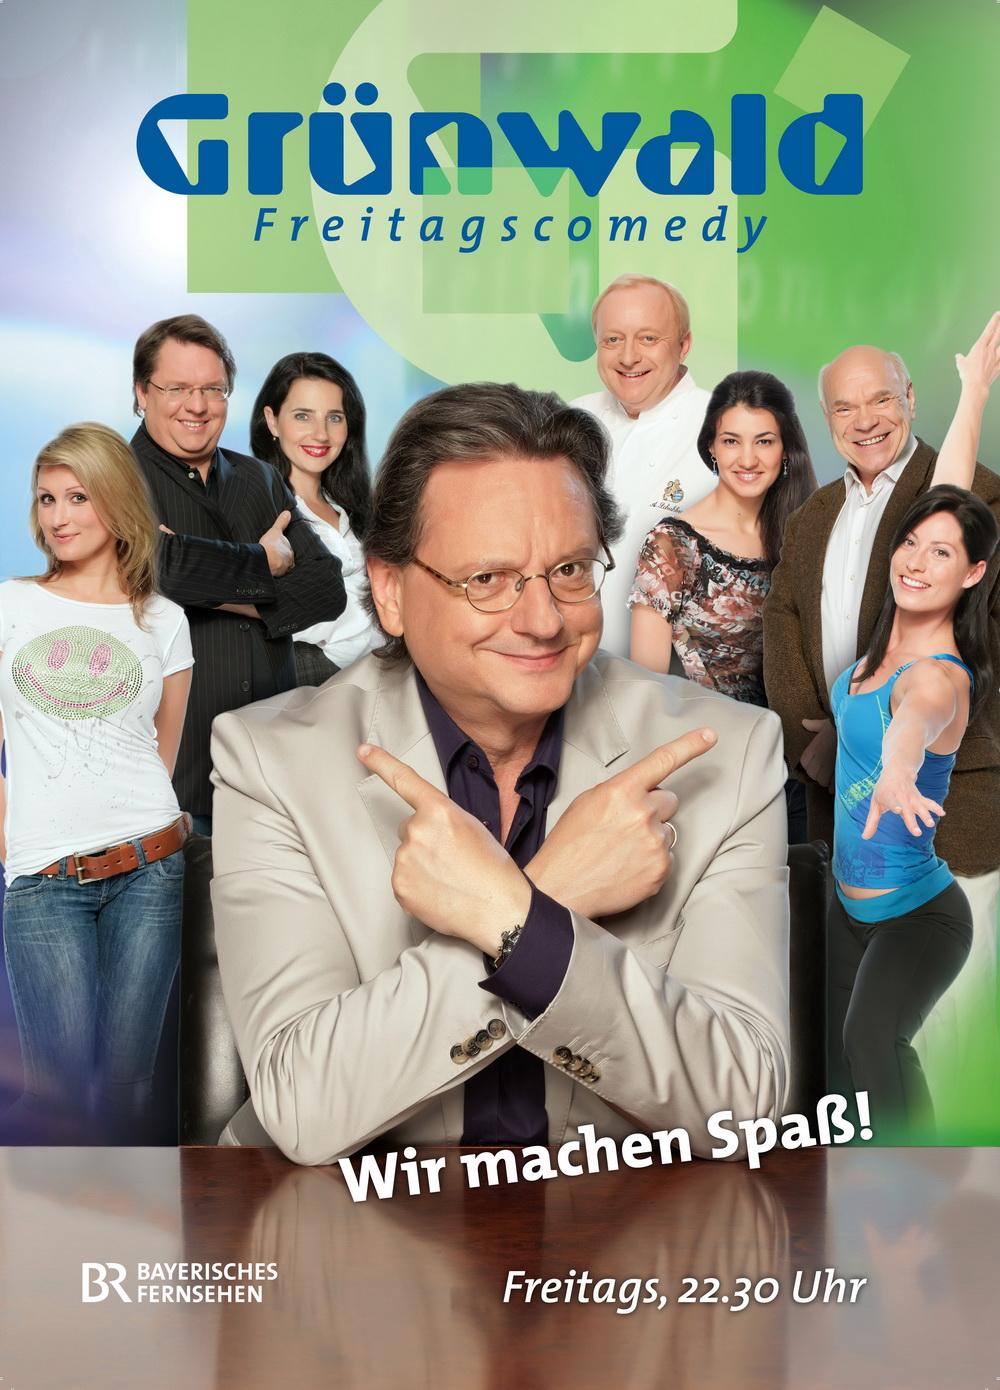 Poster Grünwald Freitagscomedy